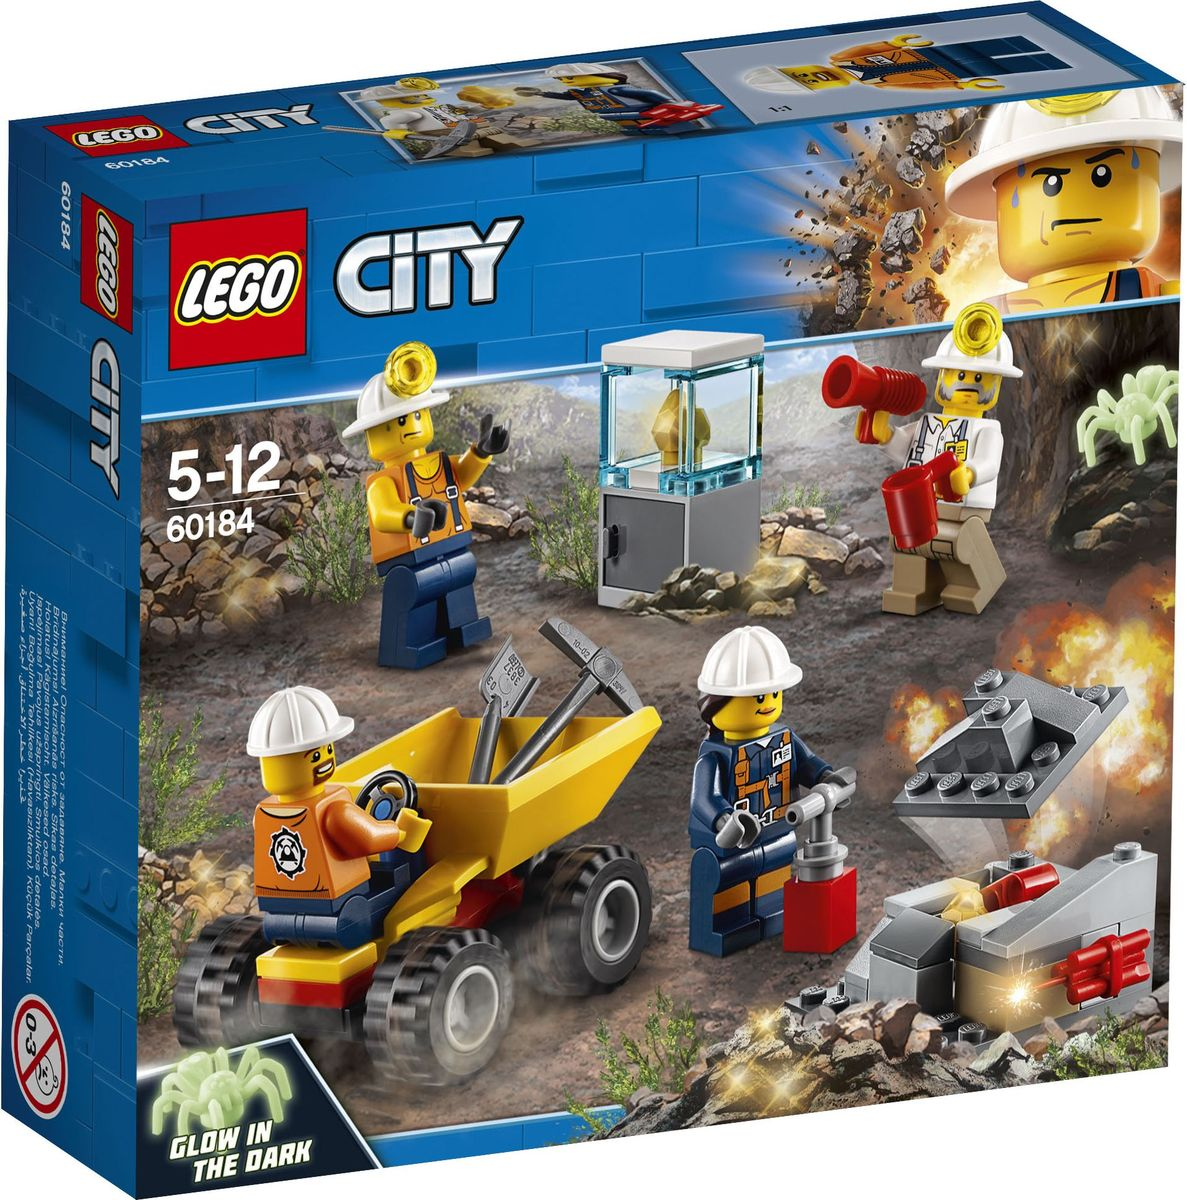 LEGO City Mining 60184 Бригада шахтеров Конструктор конструктор lego city mining 60184 бригада шахтеров